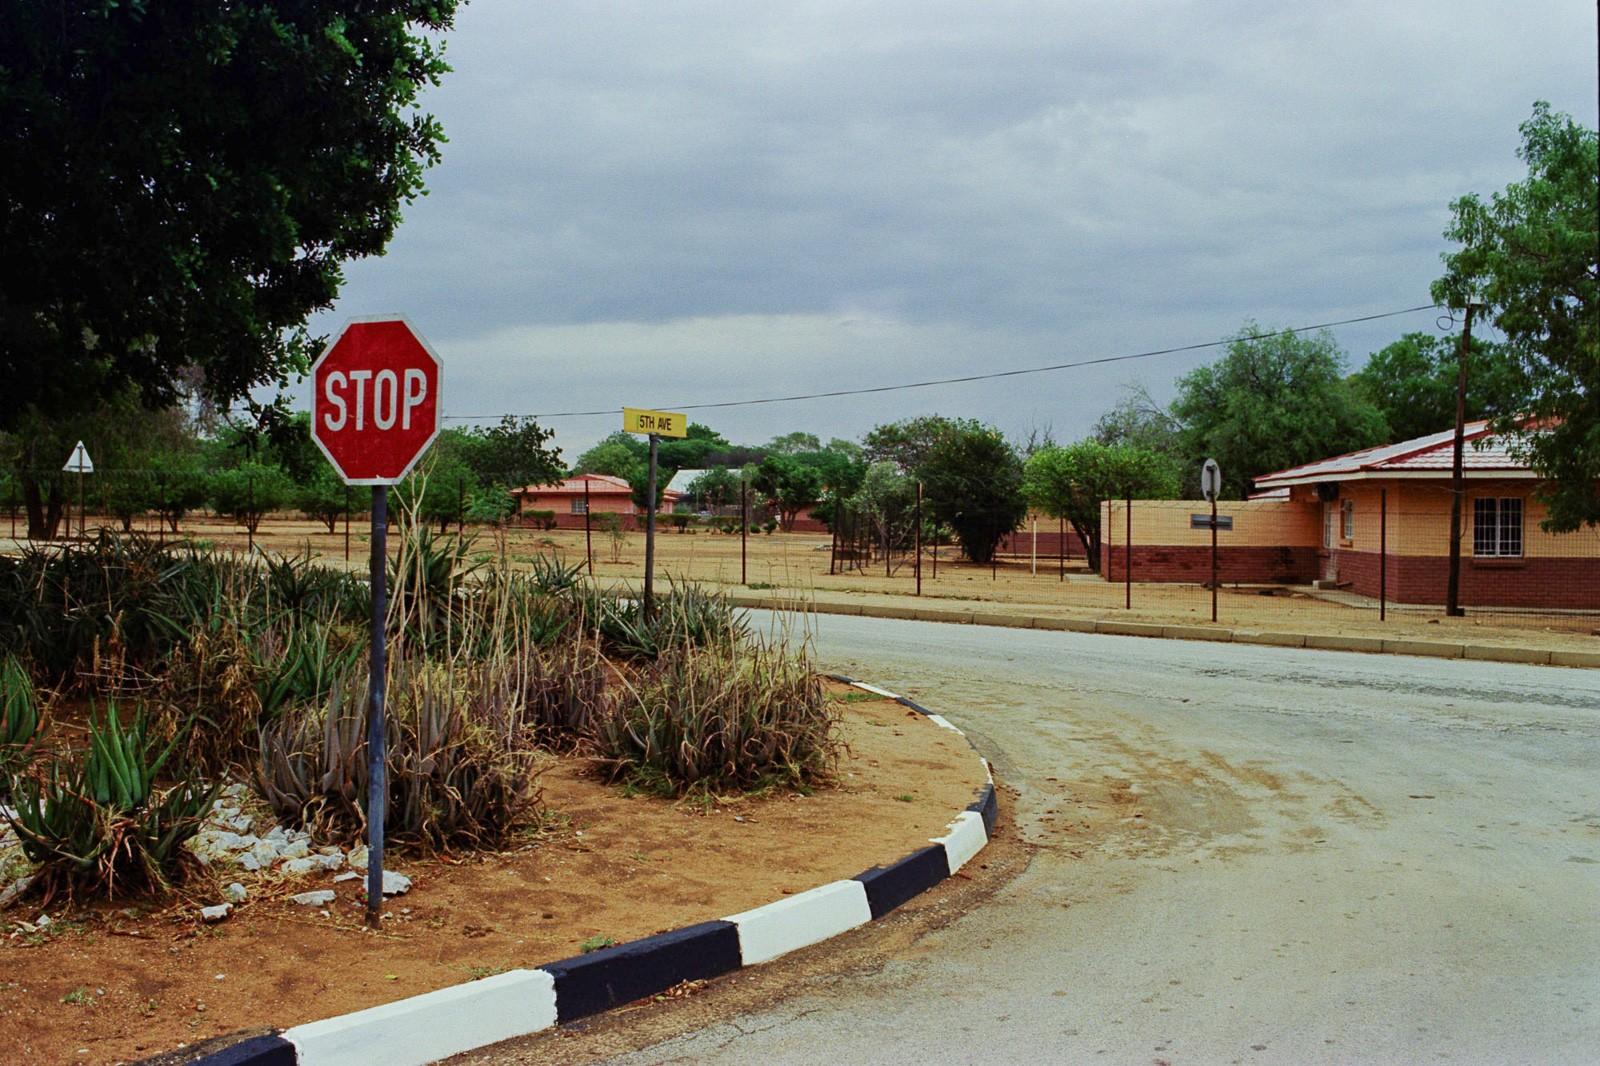 namibia-desolation-15.jpg